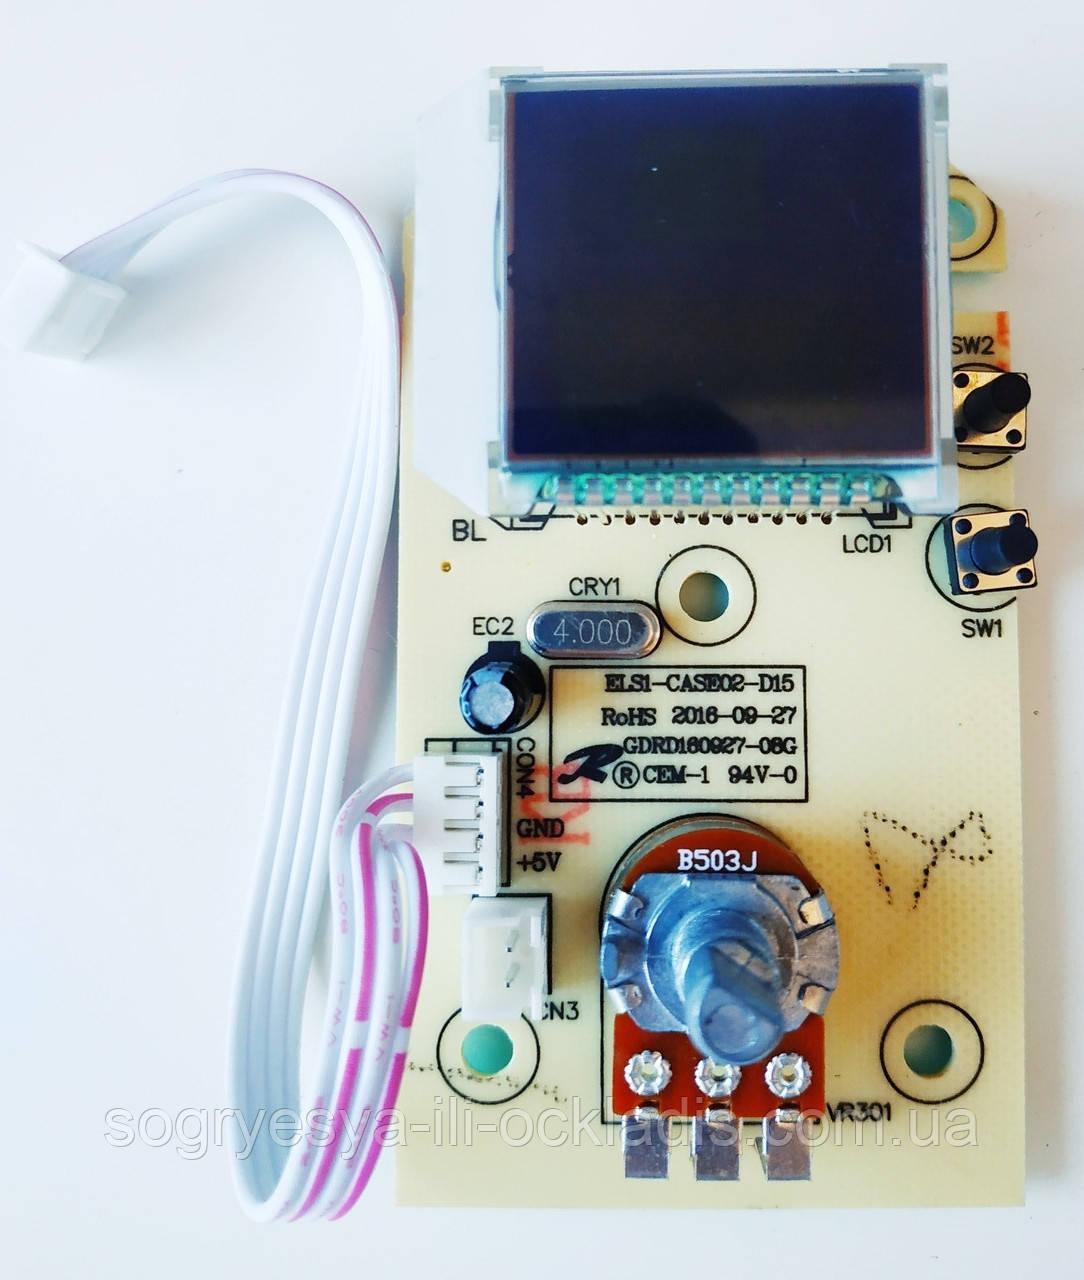 Панель управления дисплея на бойлер ZANUSSI SPLENDORE XP PCB ZWH/S 7.03.05.00044  код товара: 7098